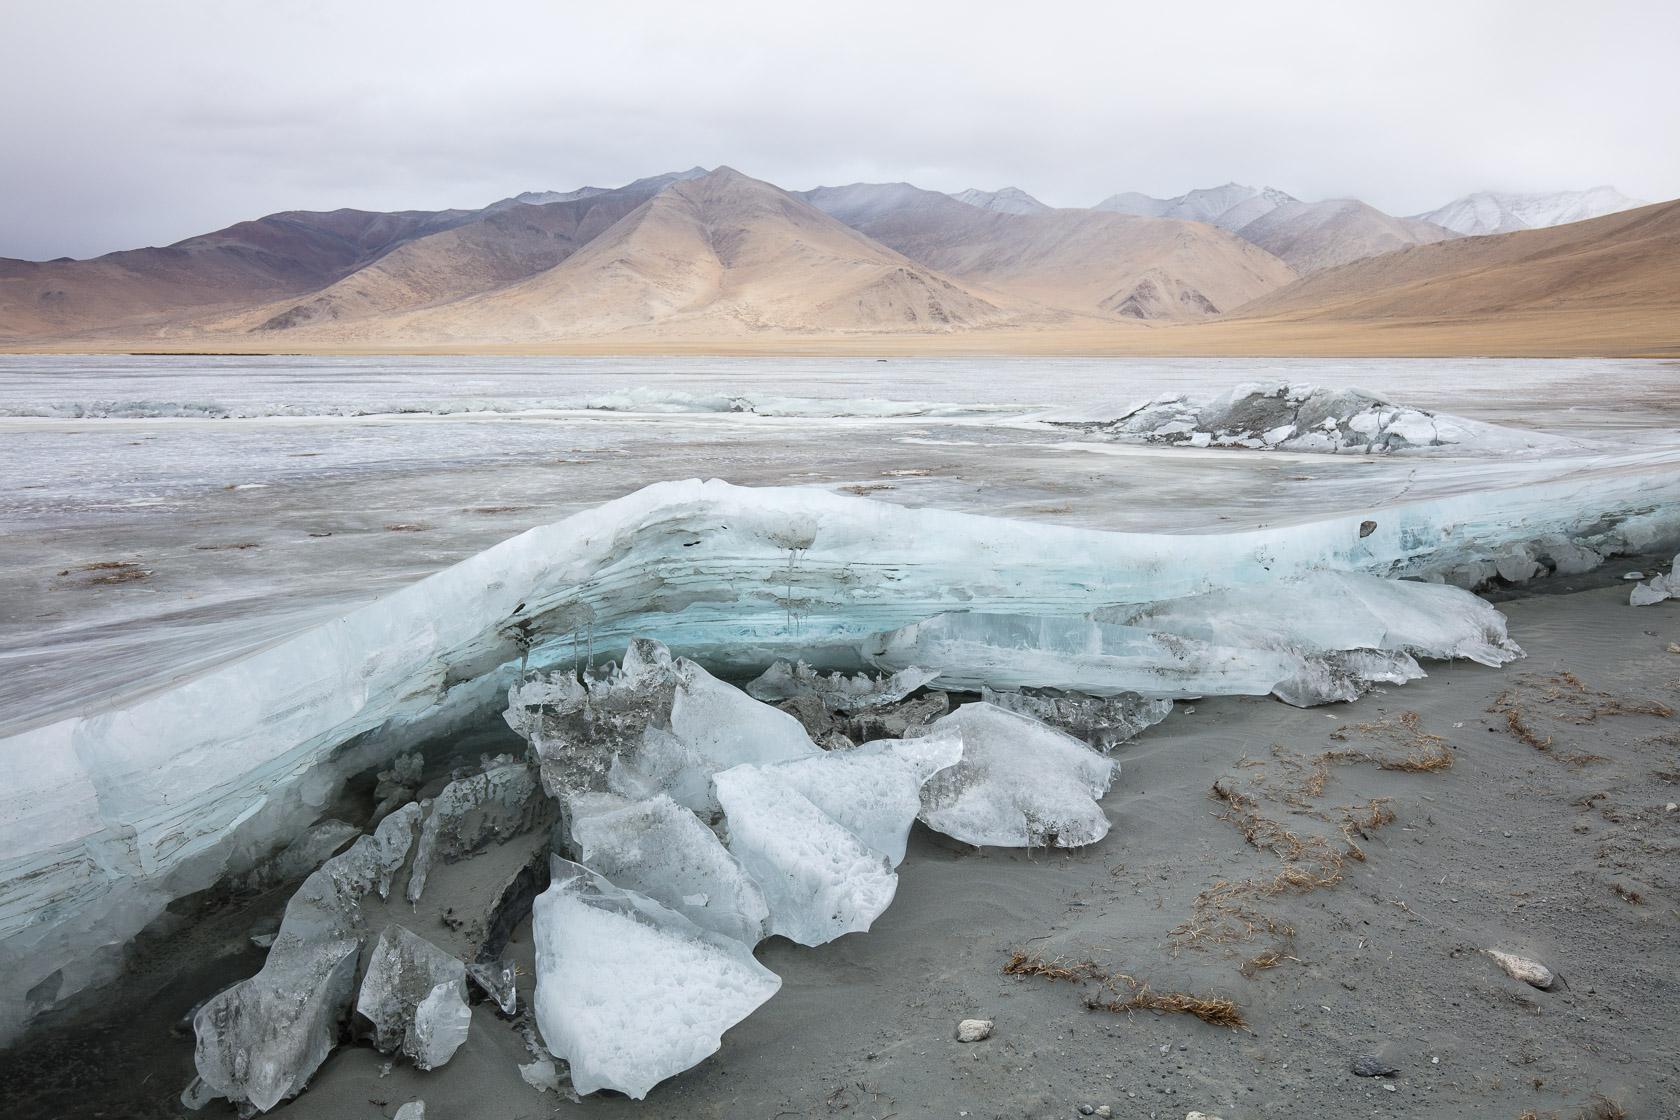 Glace du Startsapuk Tso gelé, près du Tso Kar, au Ladakh en Inde